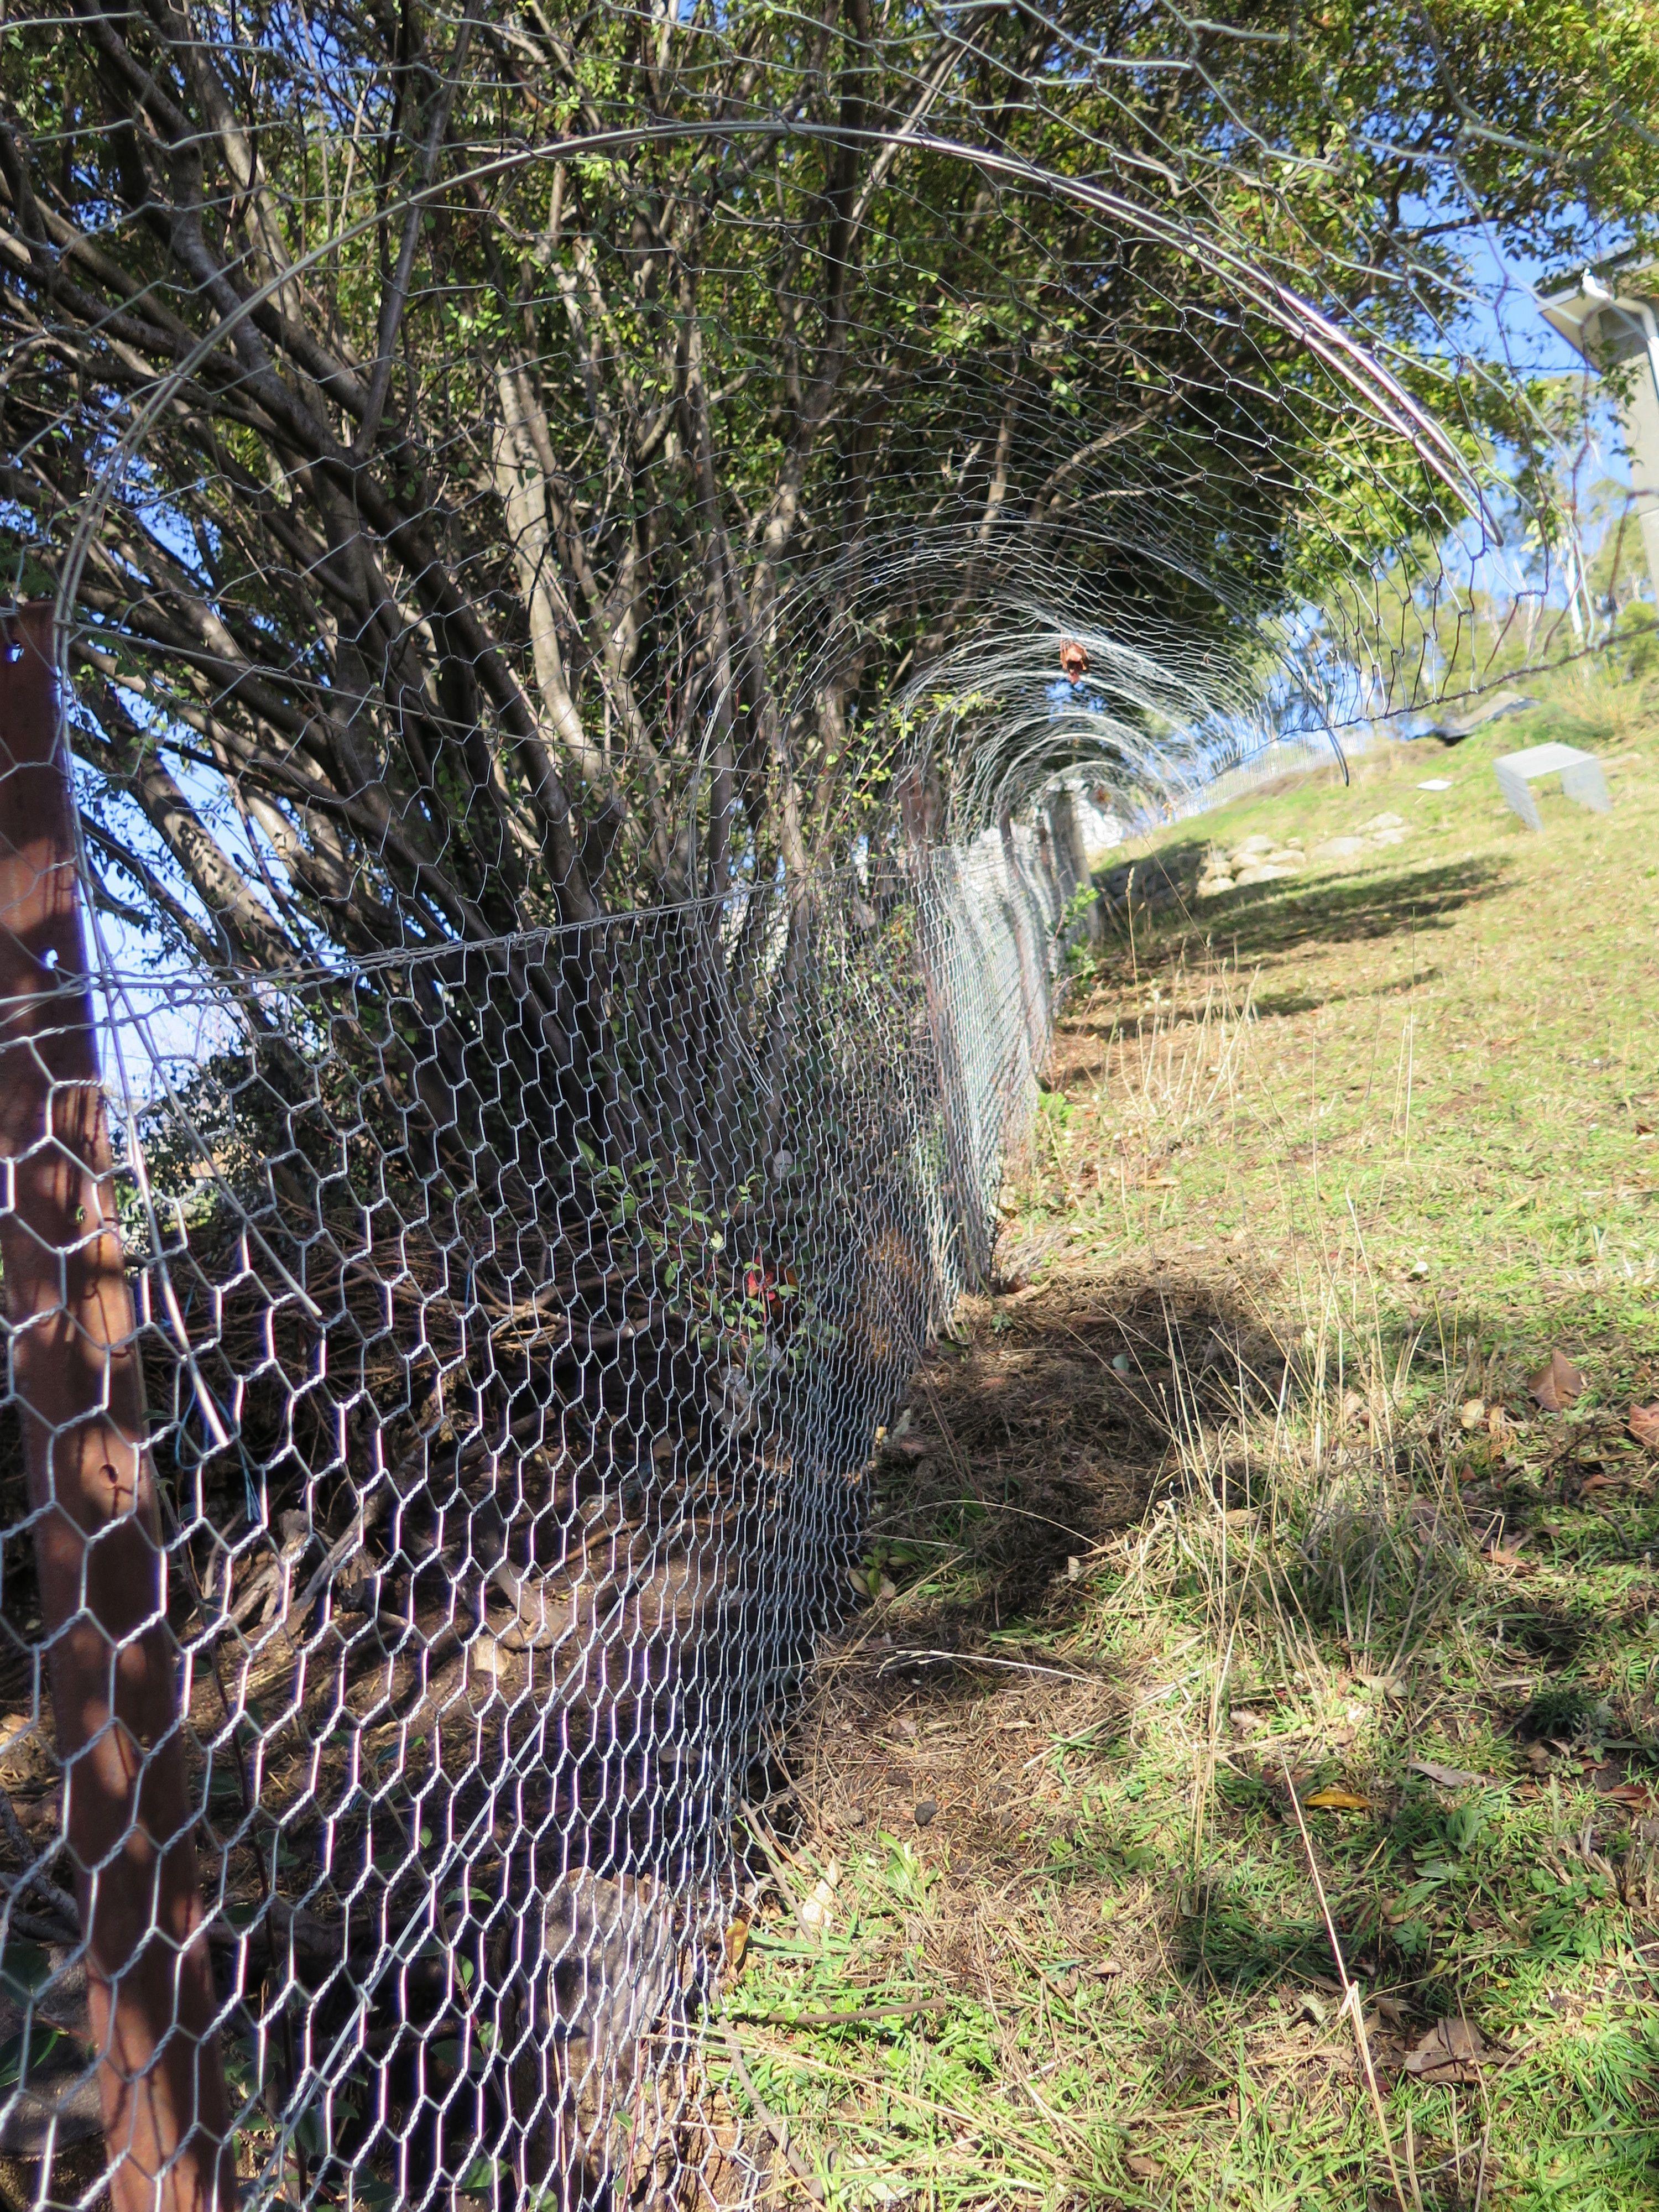 Possum proof fence | Pest proof garden | Pinterest | Fences, Garden ...